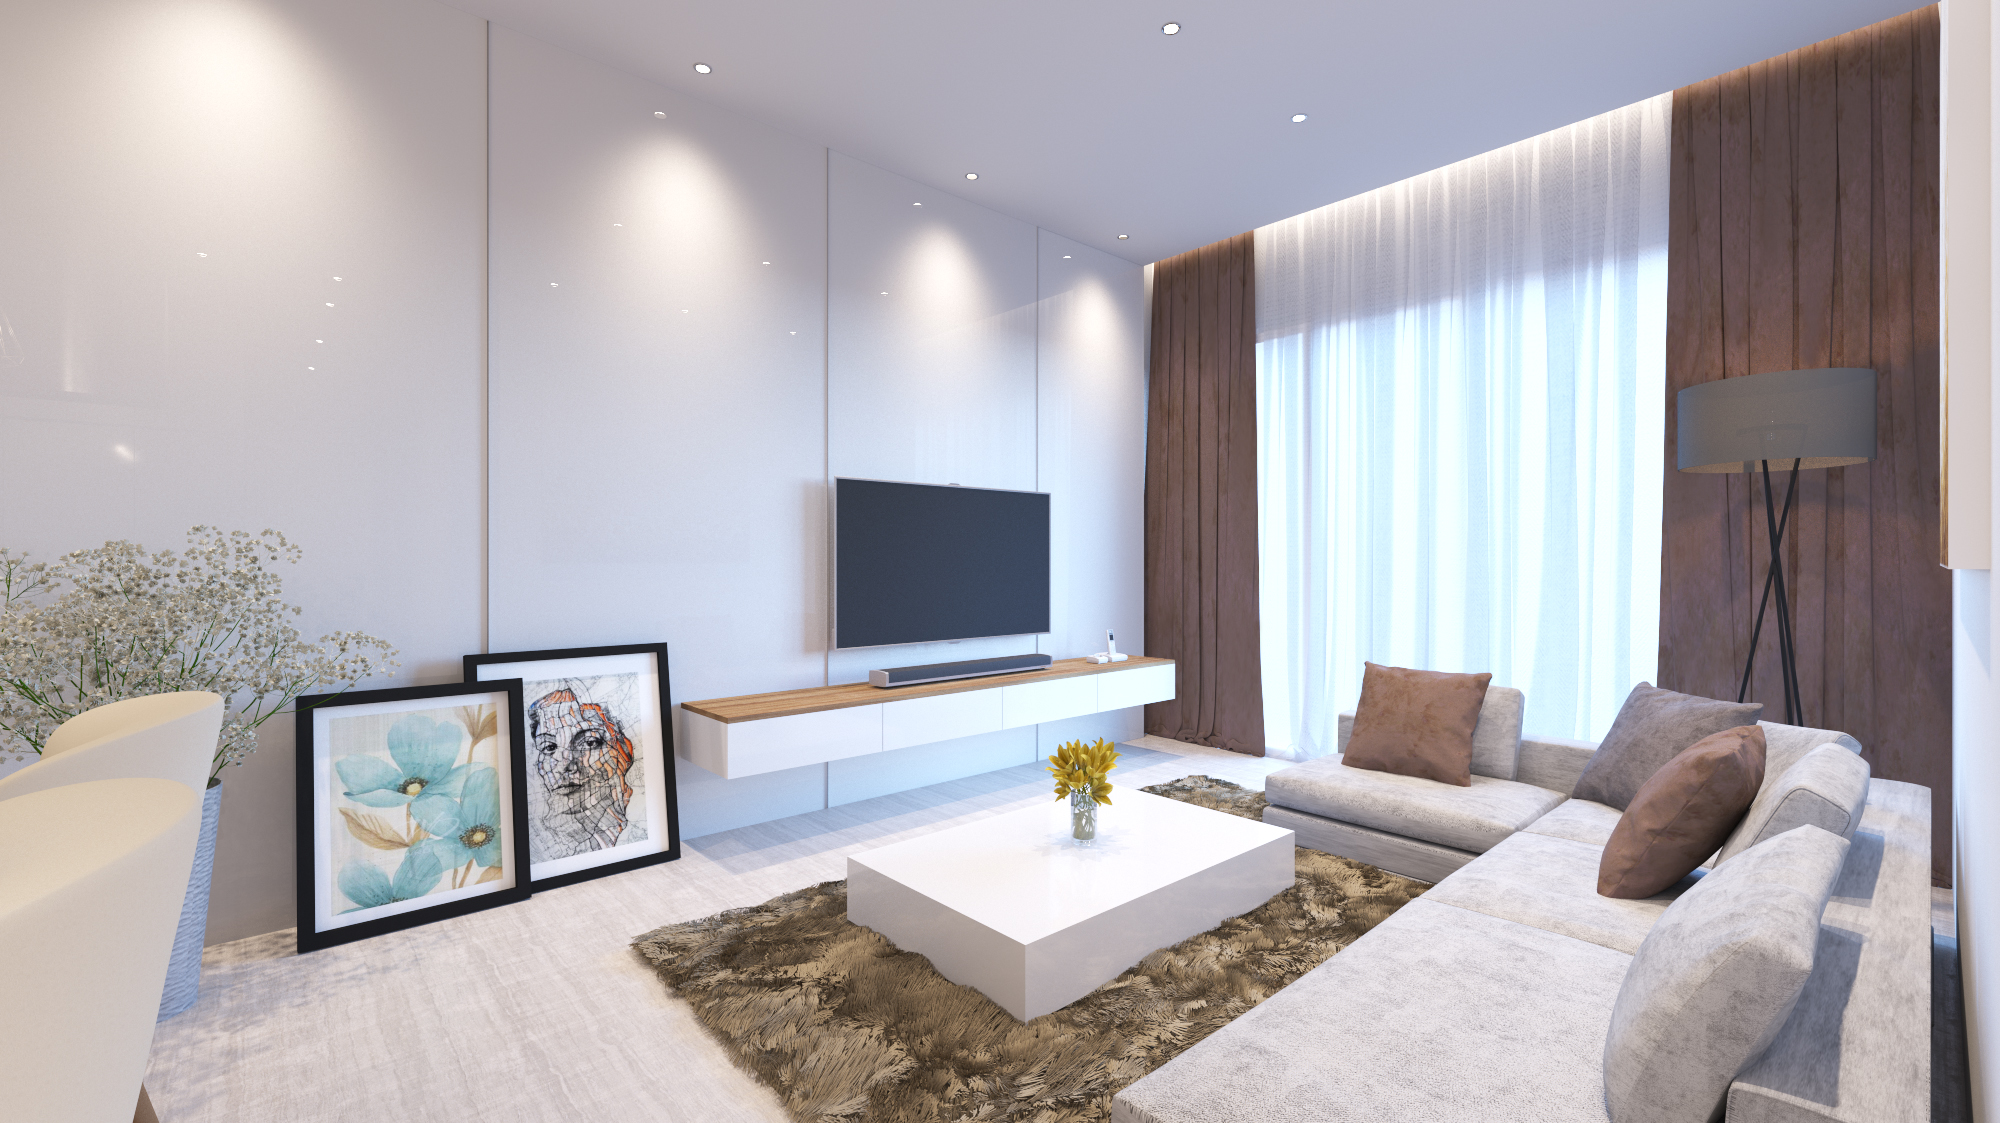 20160321 SG-APT 2-LIVING ROOM